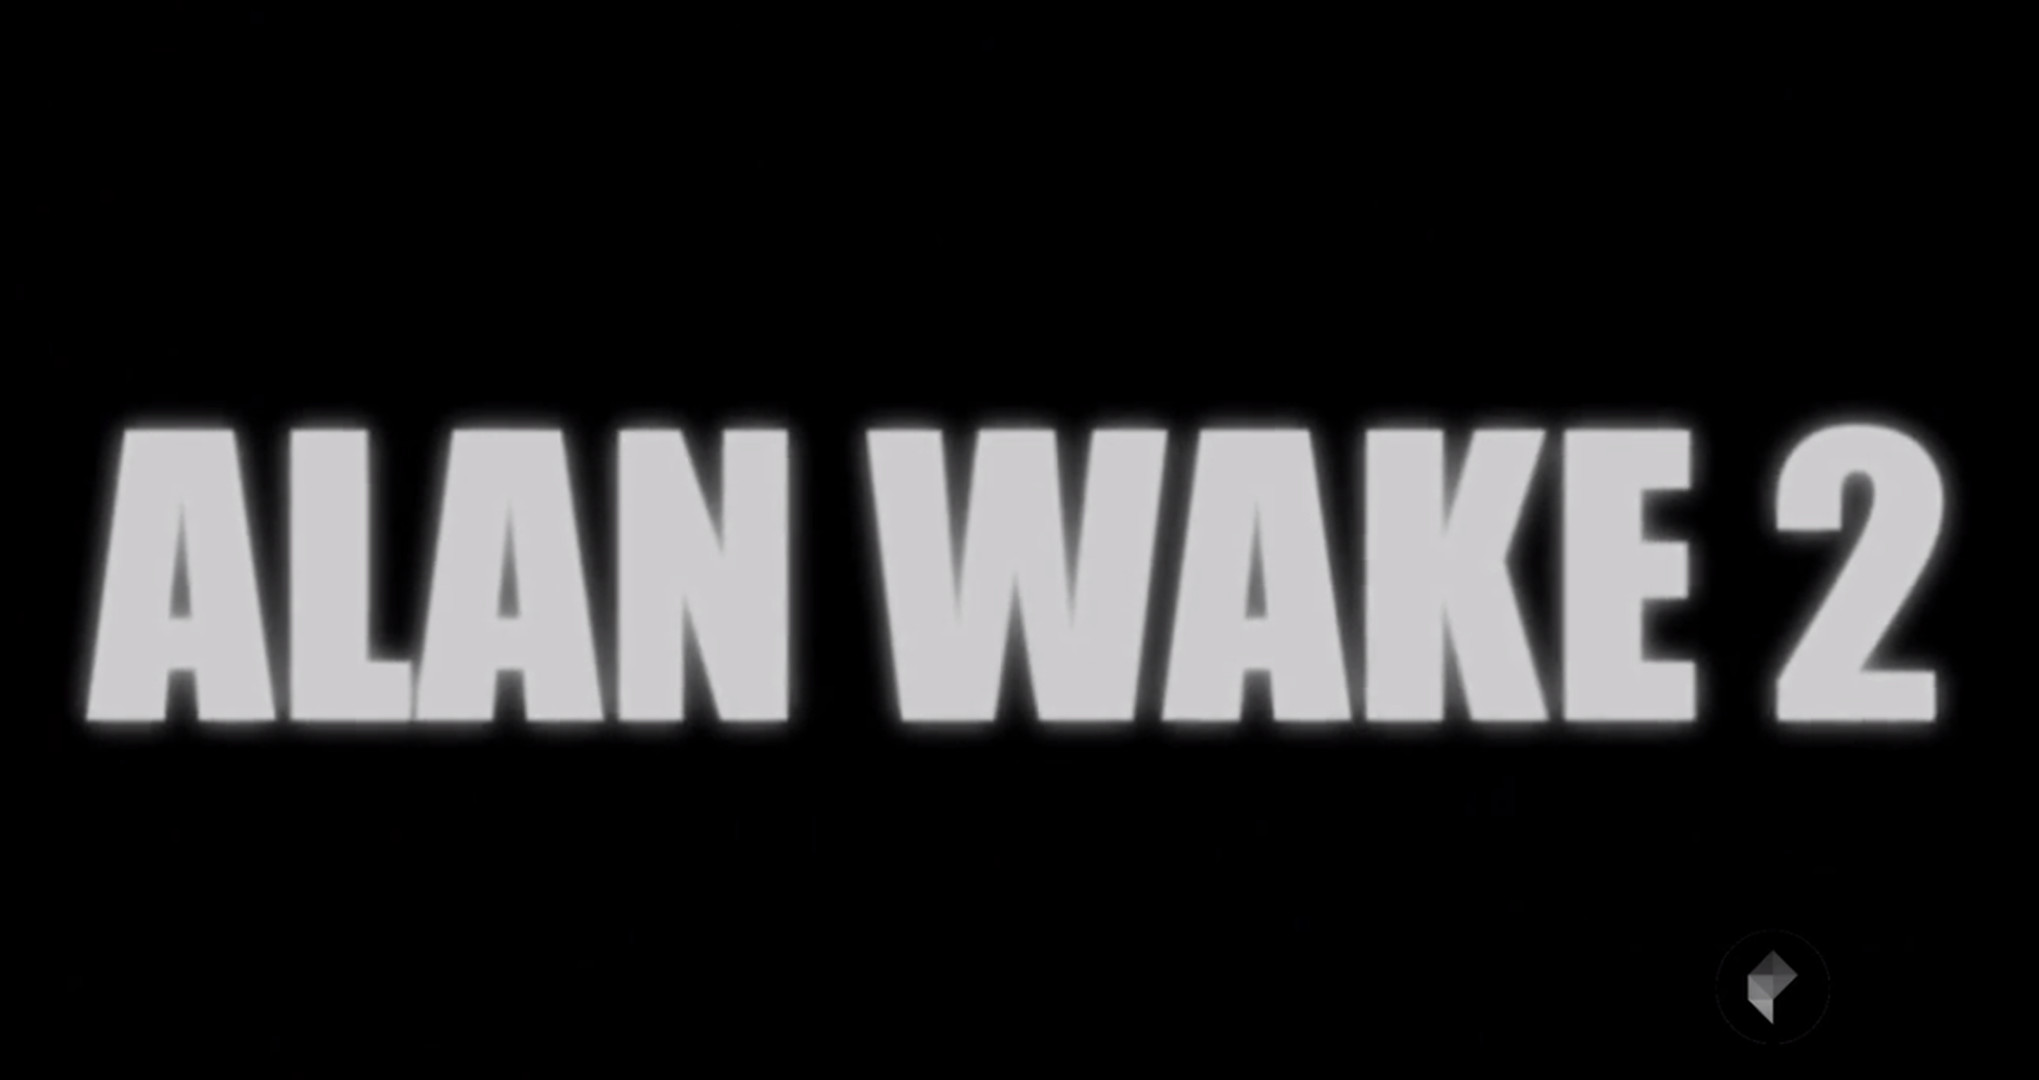 Quantum Break is full of Alan Wake easter eggs - Polygon